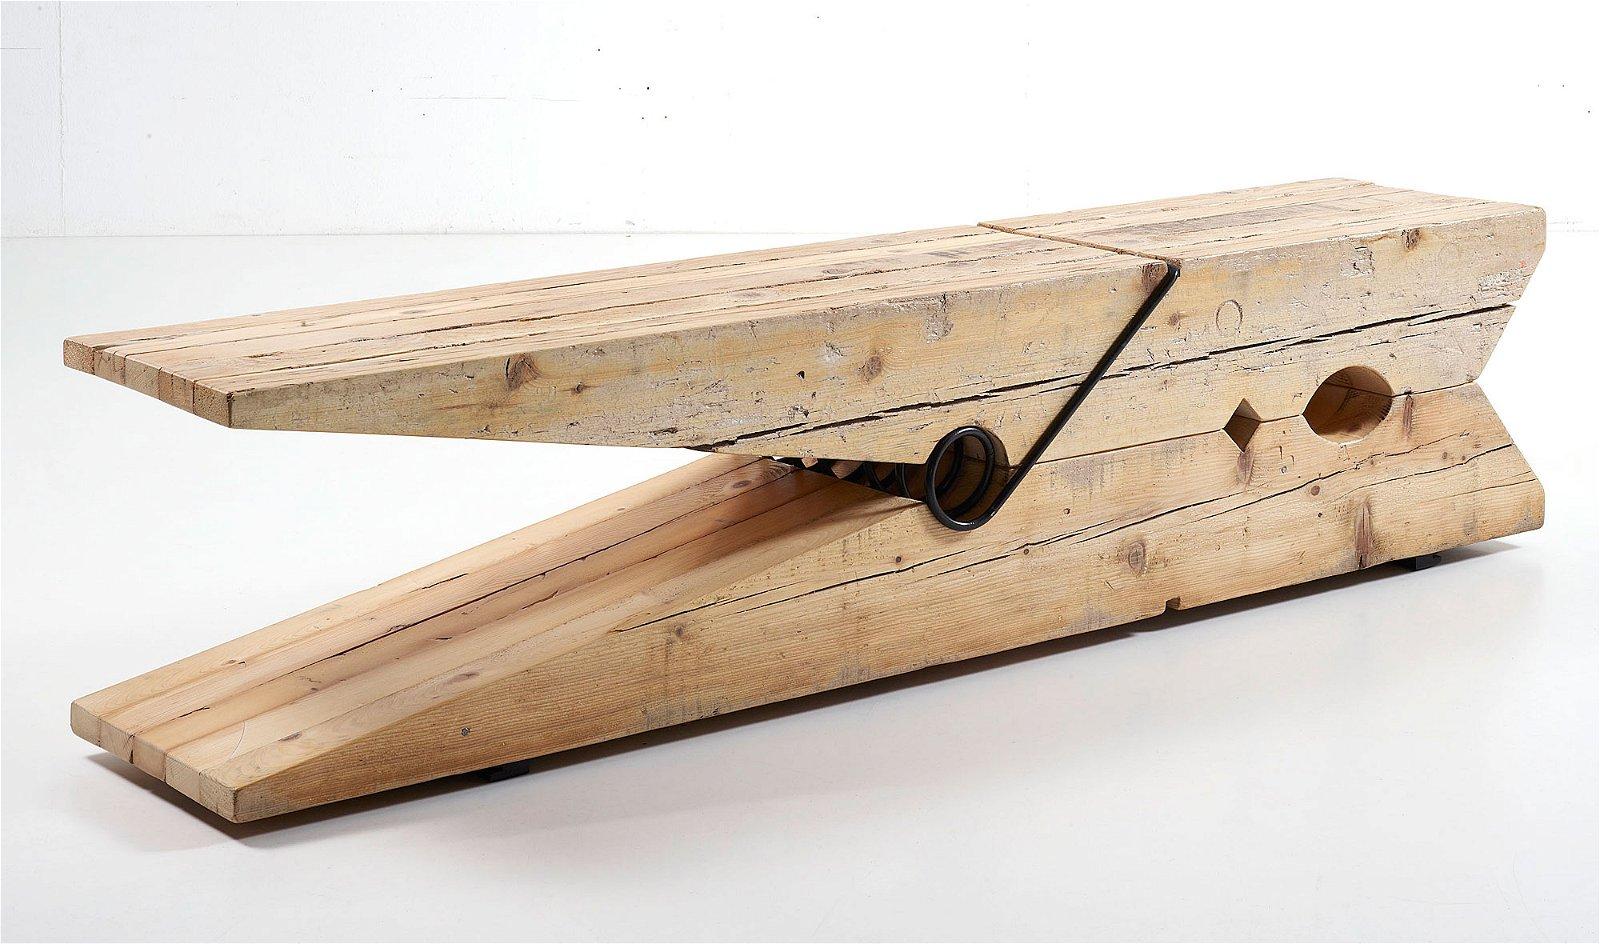 Pinza de madera centenaria reciclada